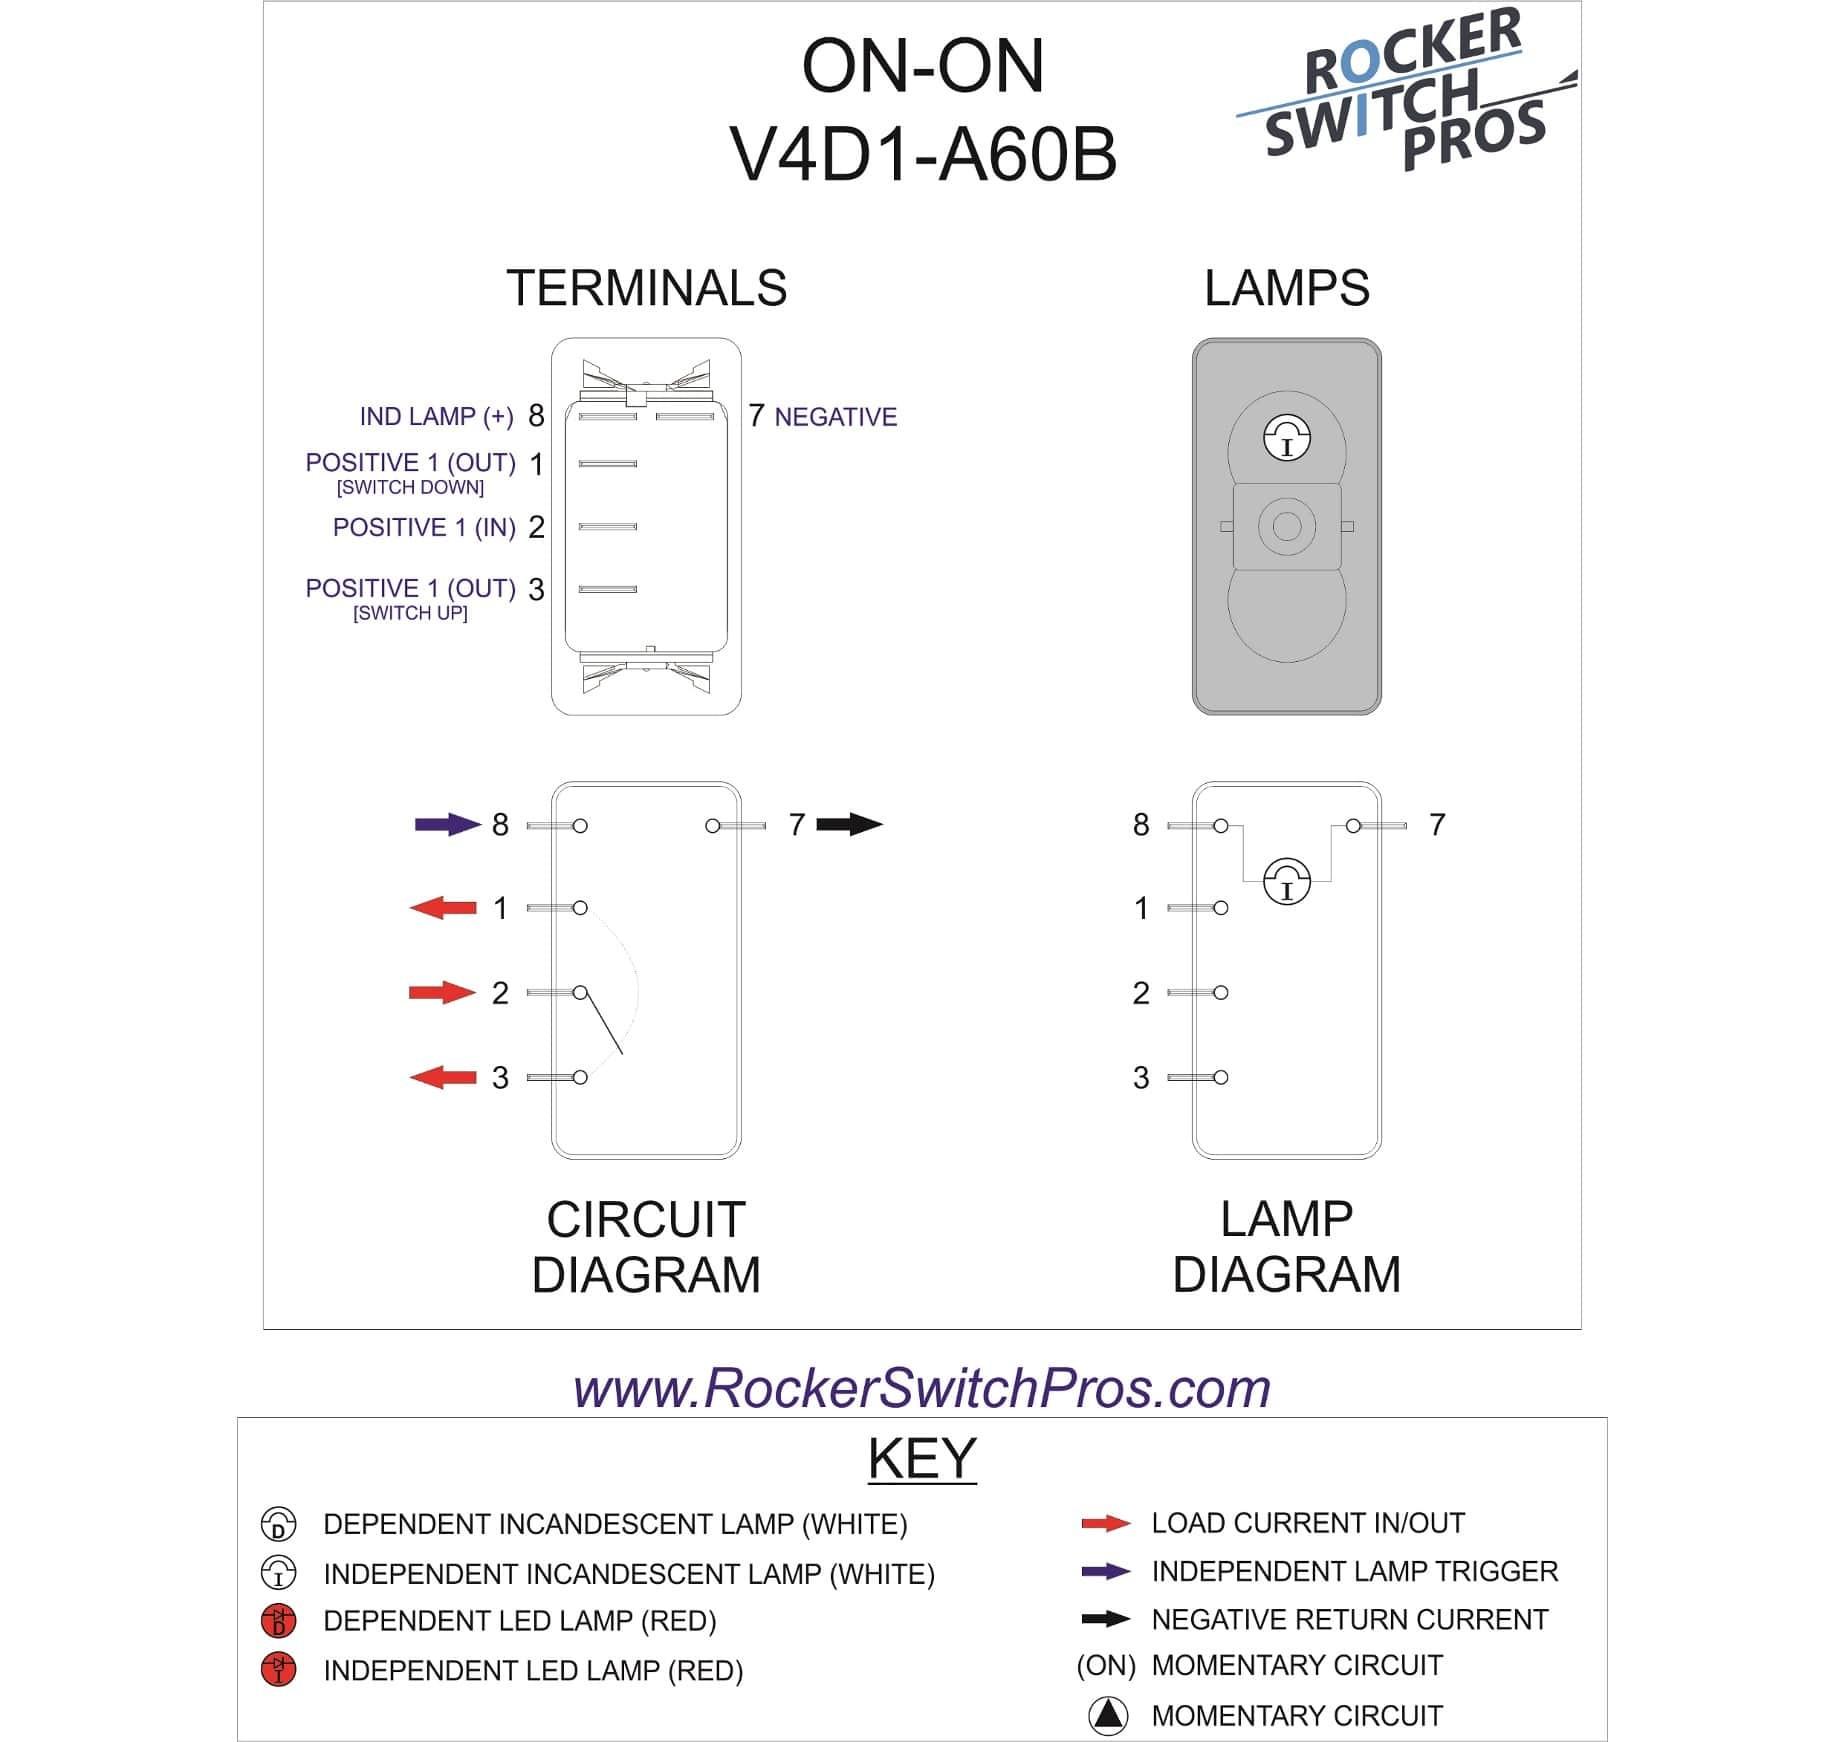 Wiring Diagram for Rocker Switch On Rocker Switch Ind Lamp Three Way Brilliant Wiring Diagram Blurts Of Wiring Diagram for Rocker Switch